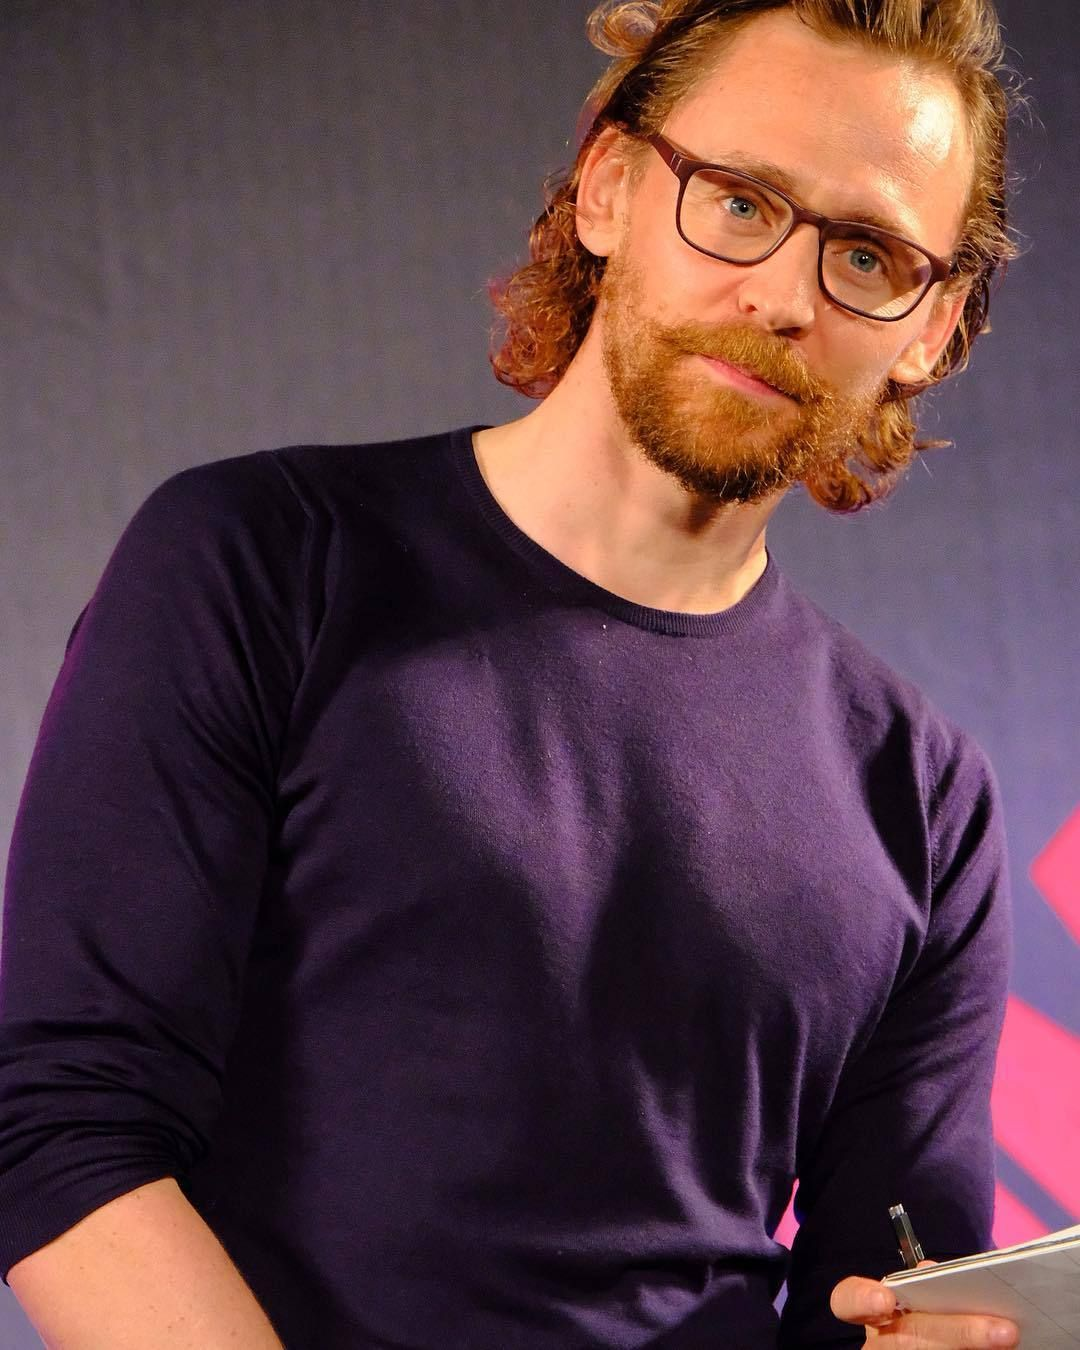 Actores Porno Tomy tom hiddleston. #tokyocomiccon december 2018. via twitter